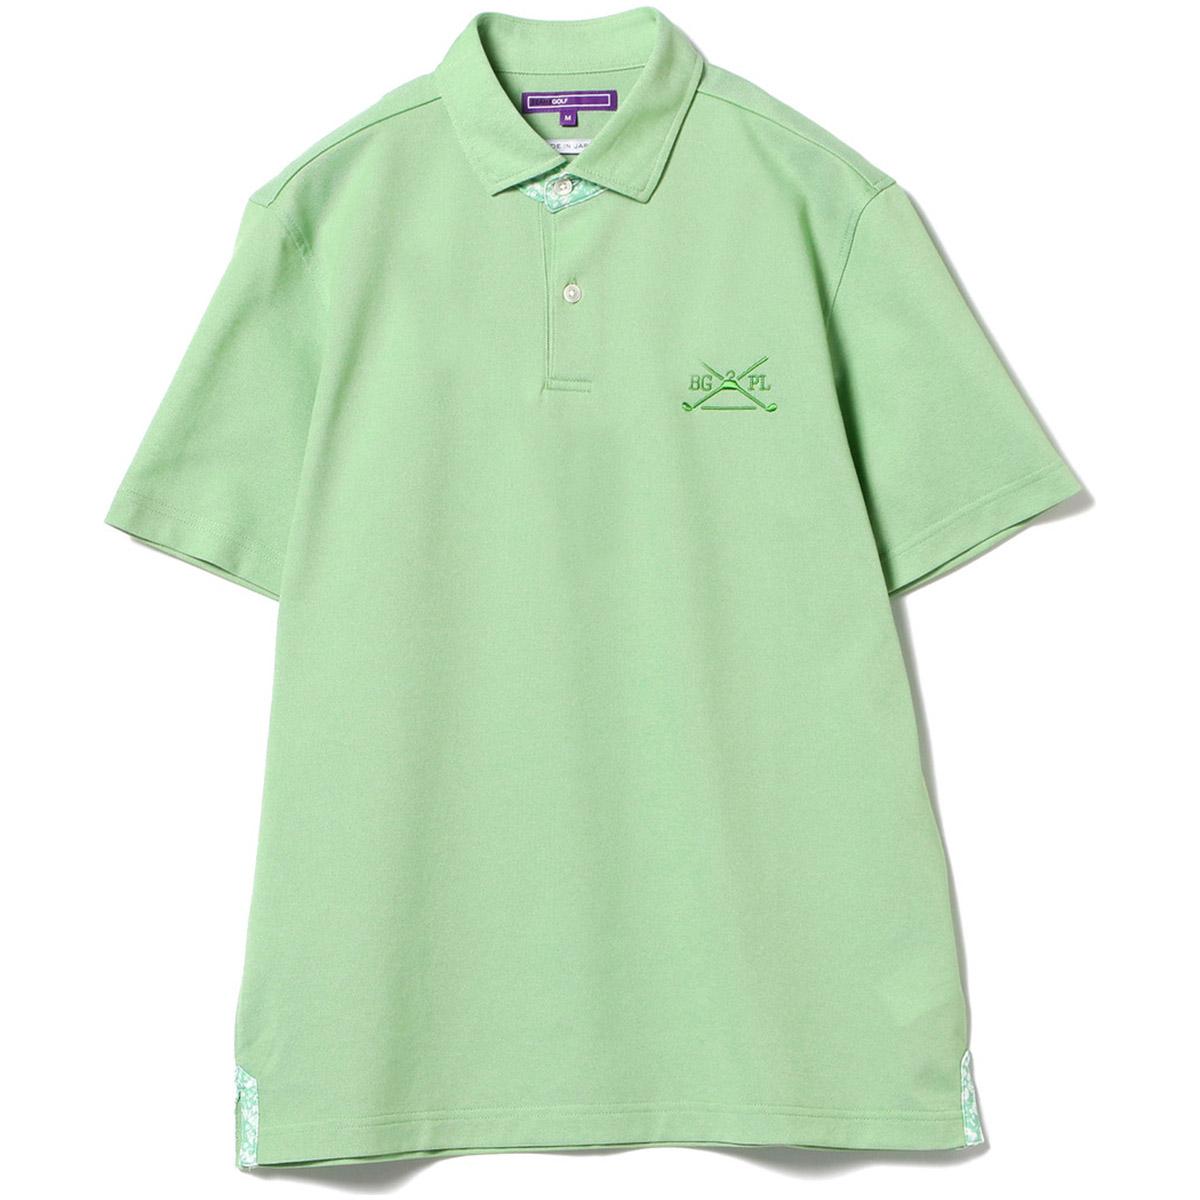 BEAMS GOLF PURPLE LABEL アロフト 鹿の子 ポロシャツ